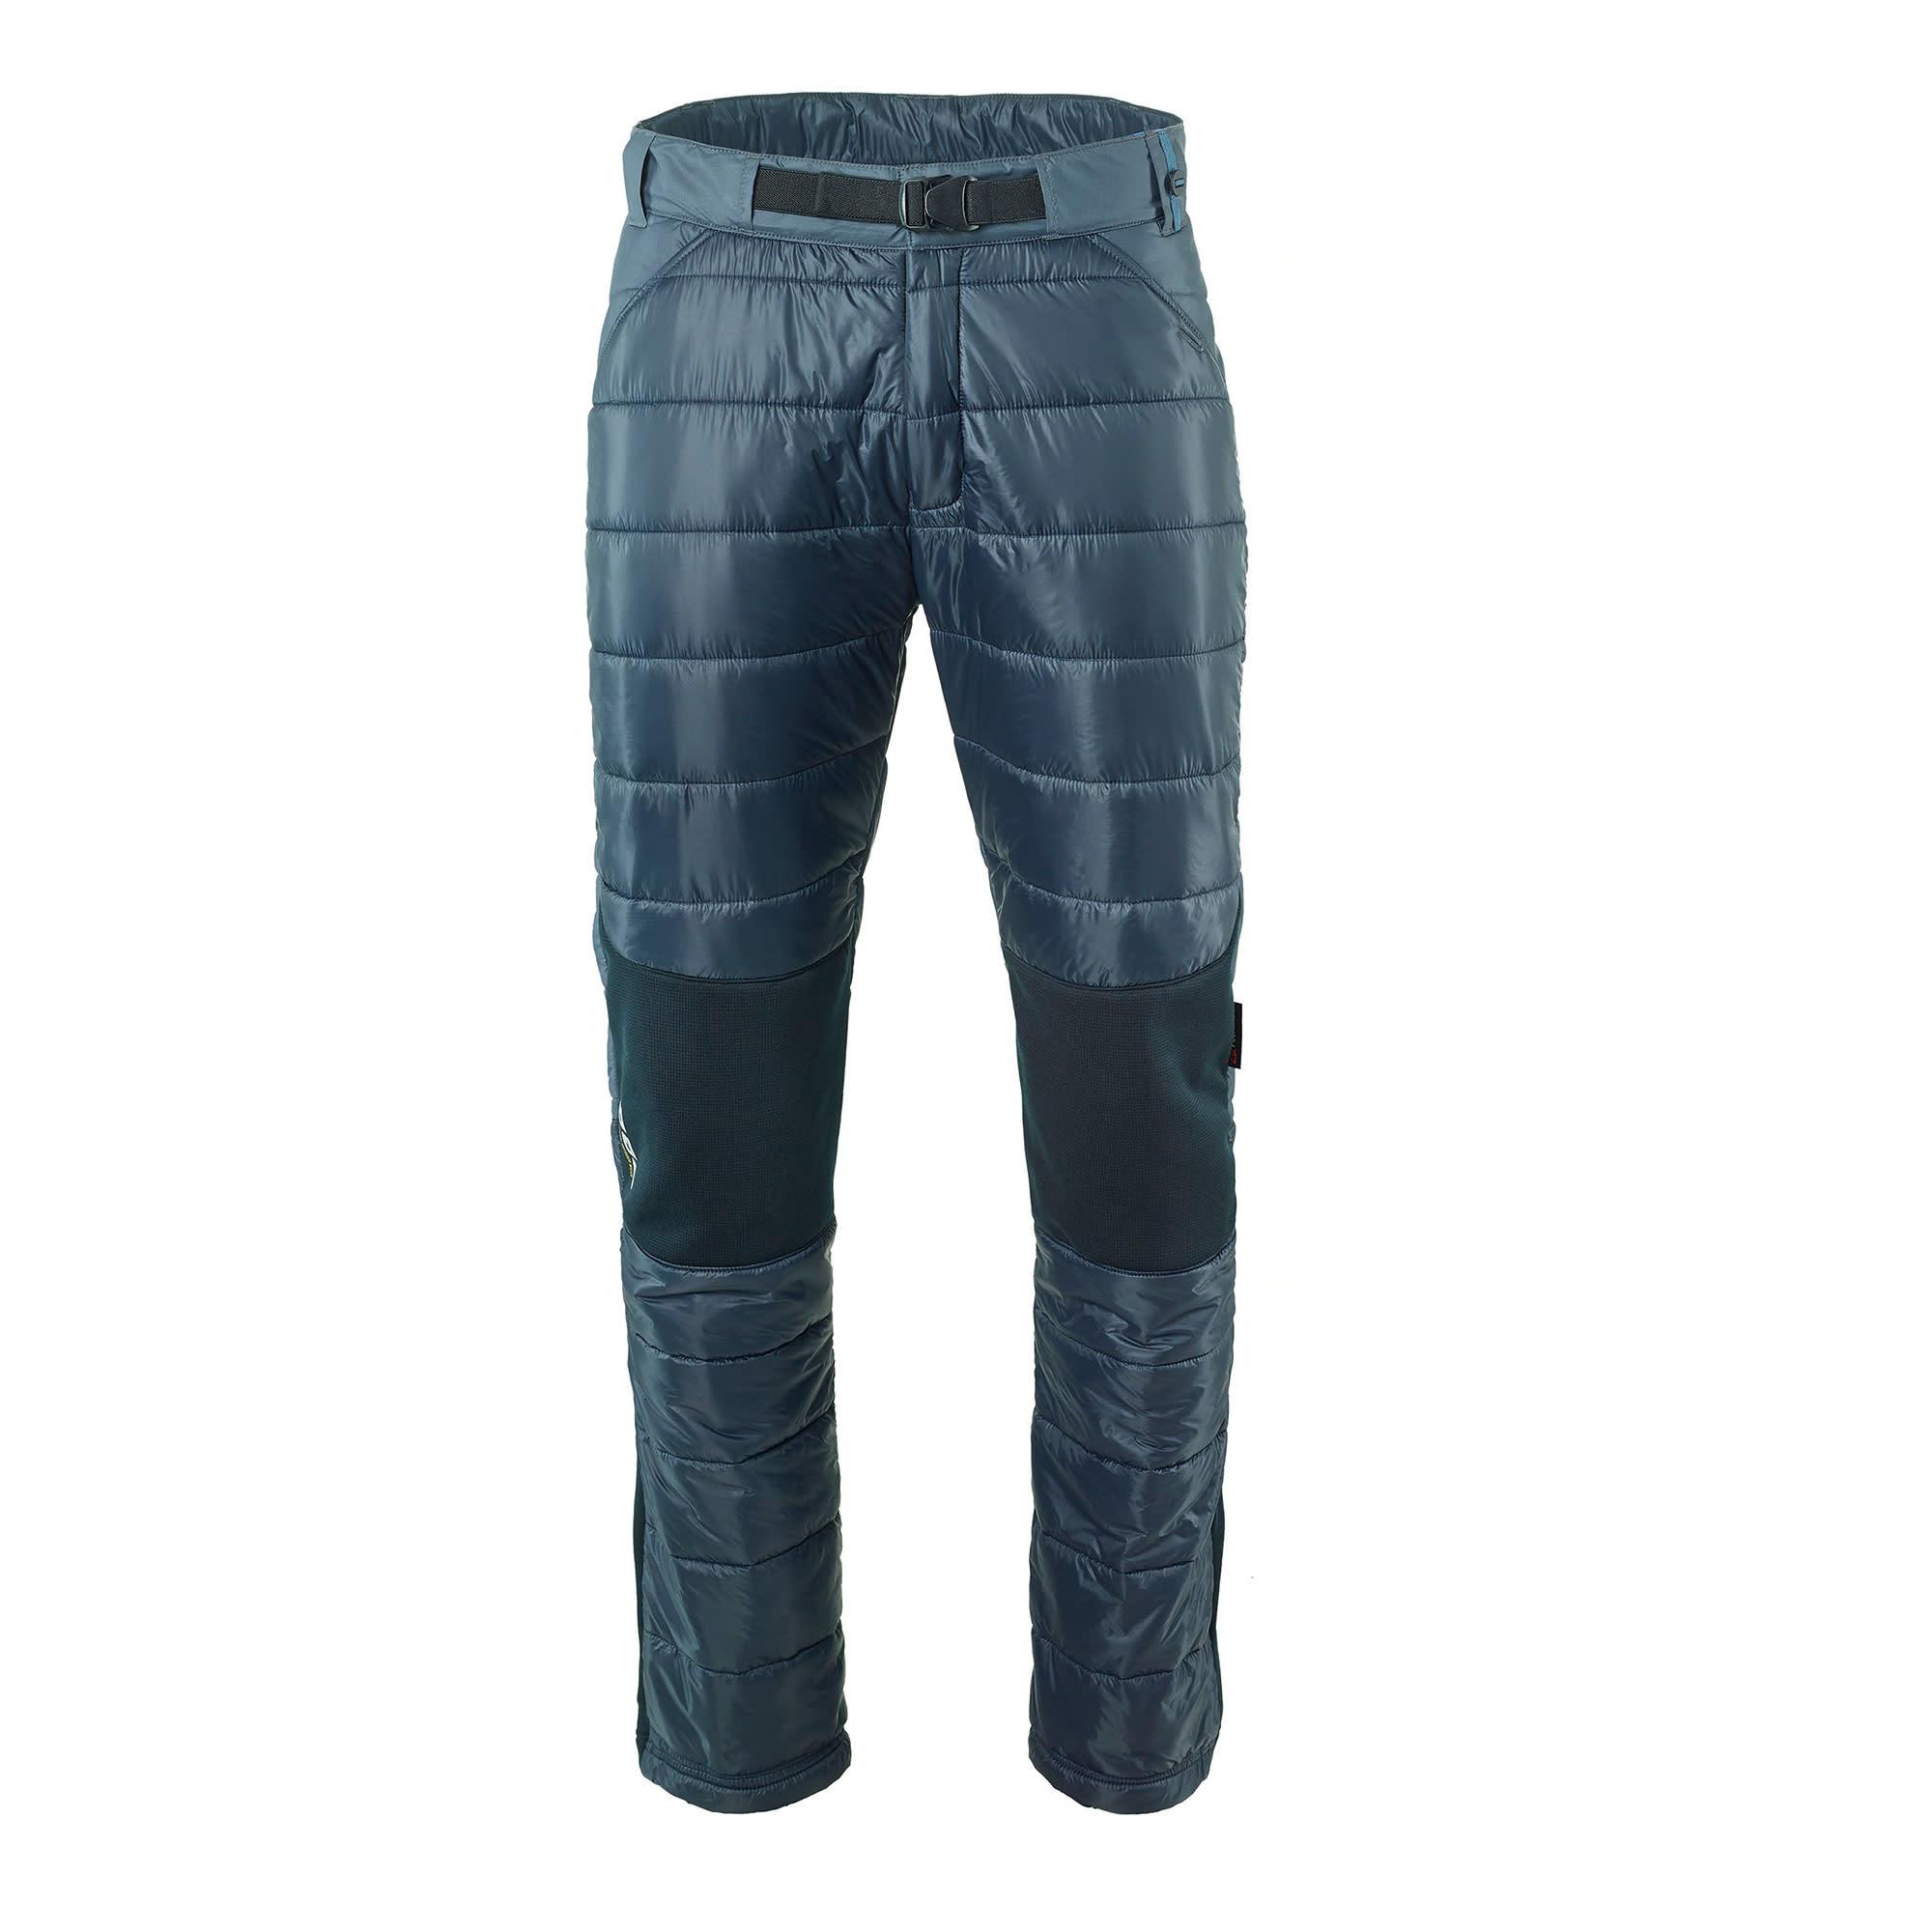 Onka Pants Black/Dark Grey